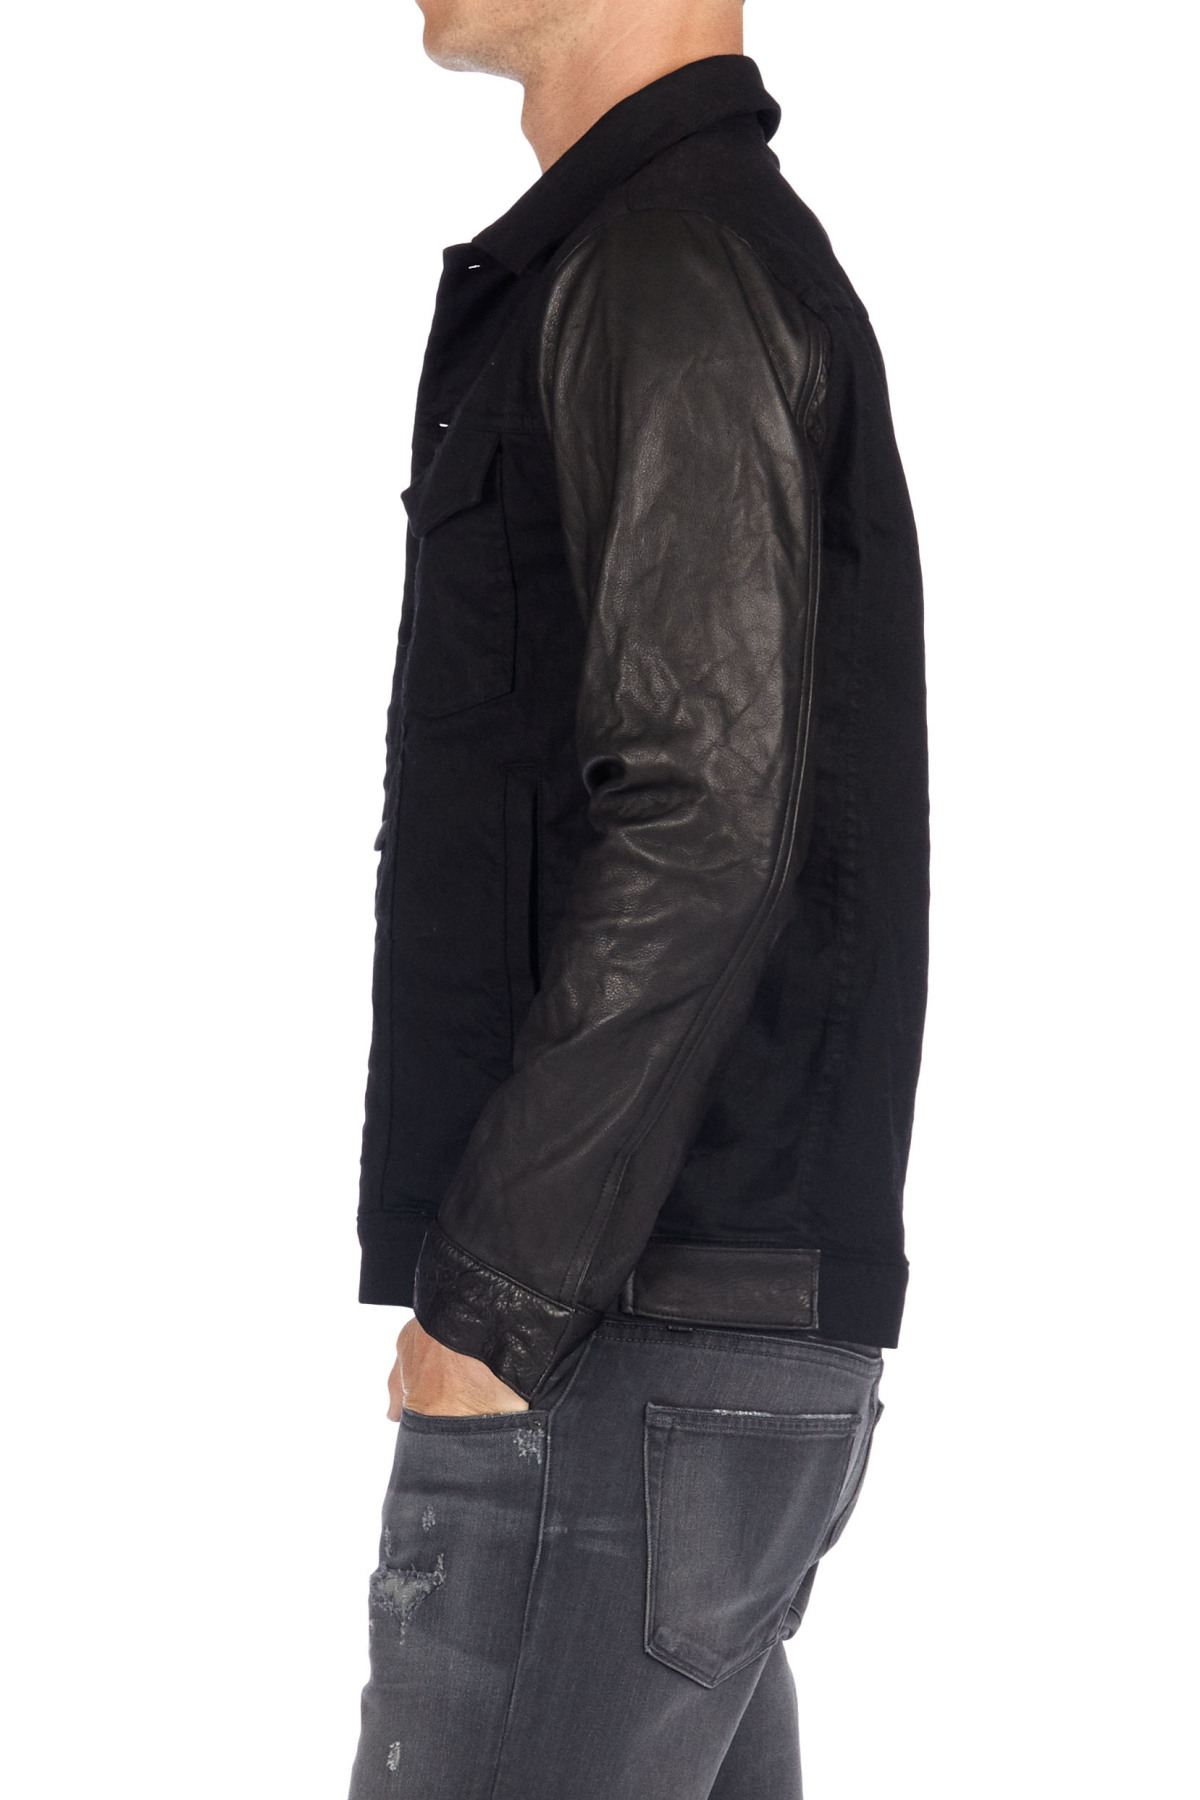 j brand florence coat - photo#26